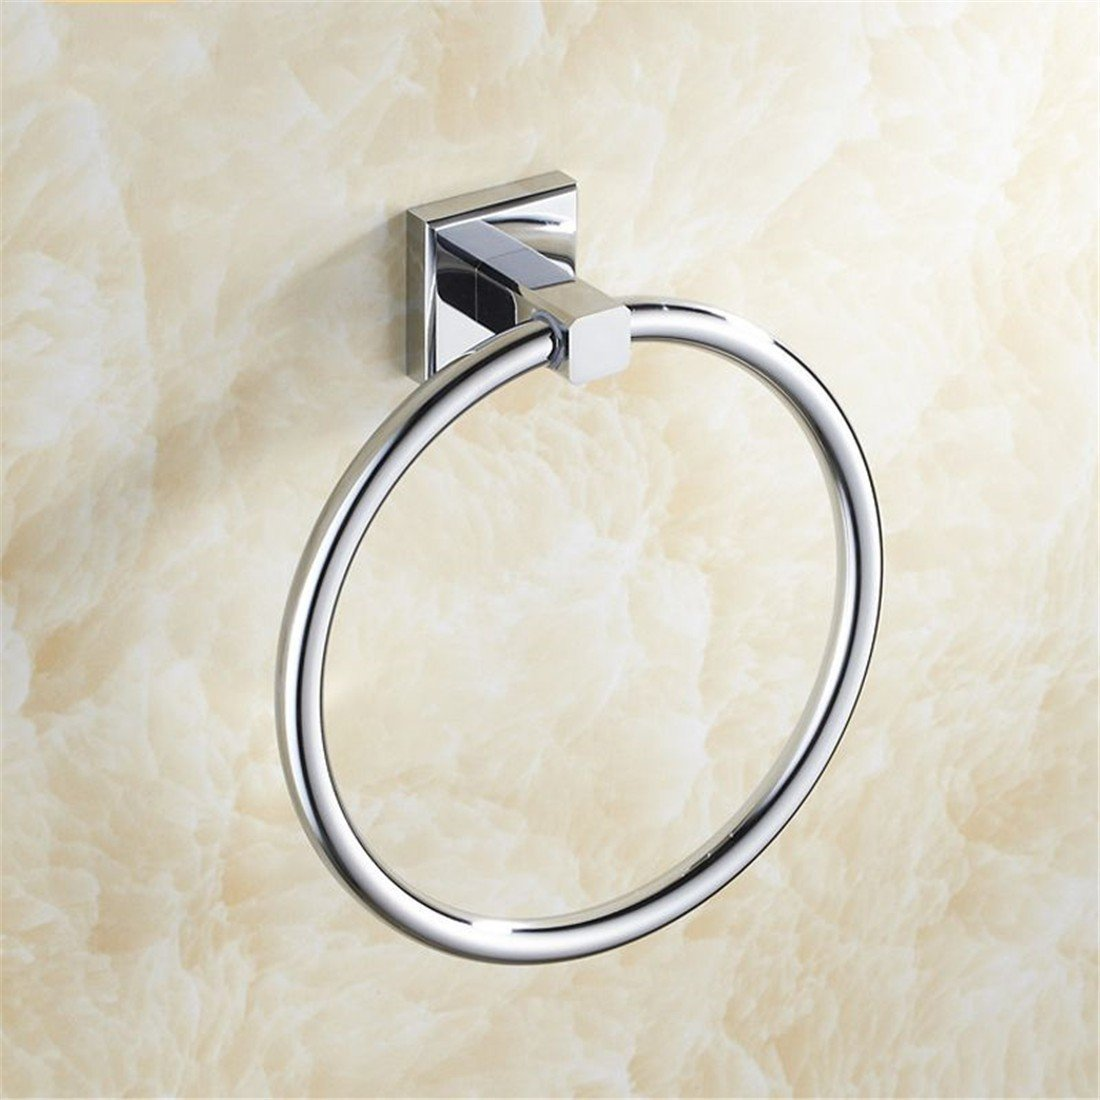 LAONA A contemporary minimalist Brass chrome bathroom accessory kit bath towel rack Towel racks, Towel Ring